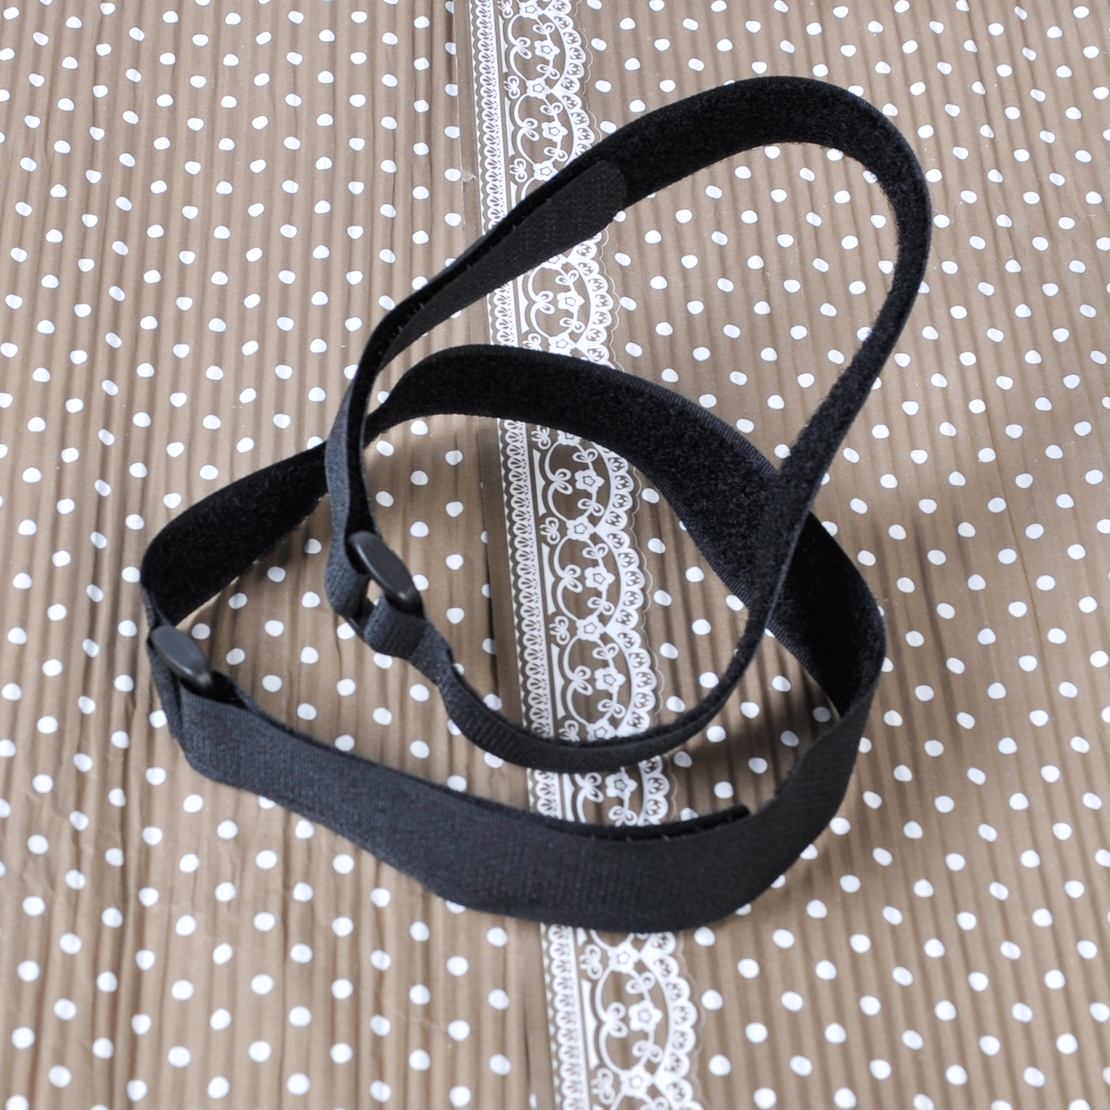 High Quality 10Pcs Black Reusable Fastener Cable Holder Tie Rope Down Straps Cord Nylon 43cm x 2cm